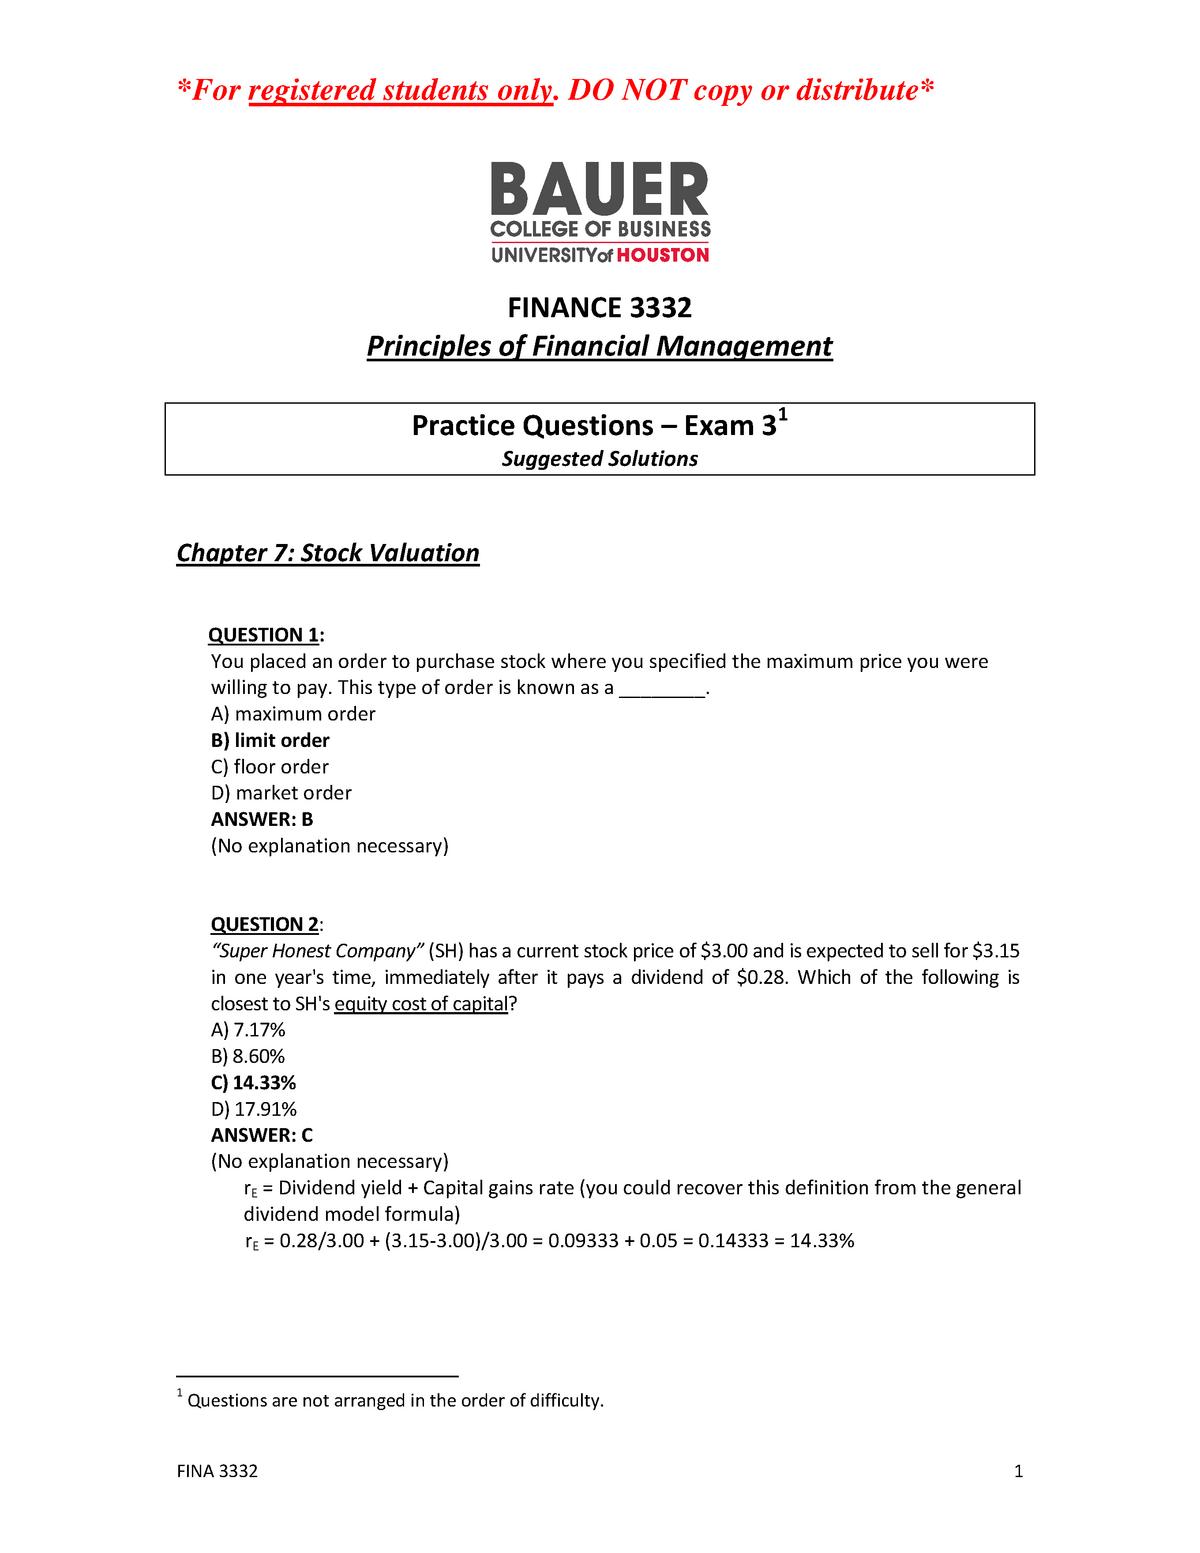 FINA 3332 Practice questions Exam 3 Solutions - FINA 3332